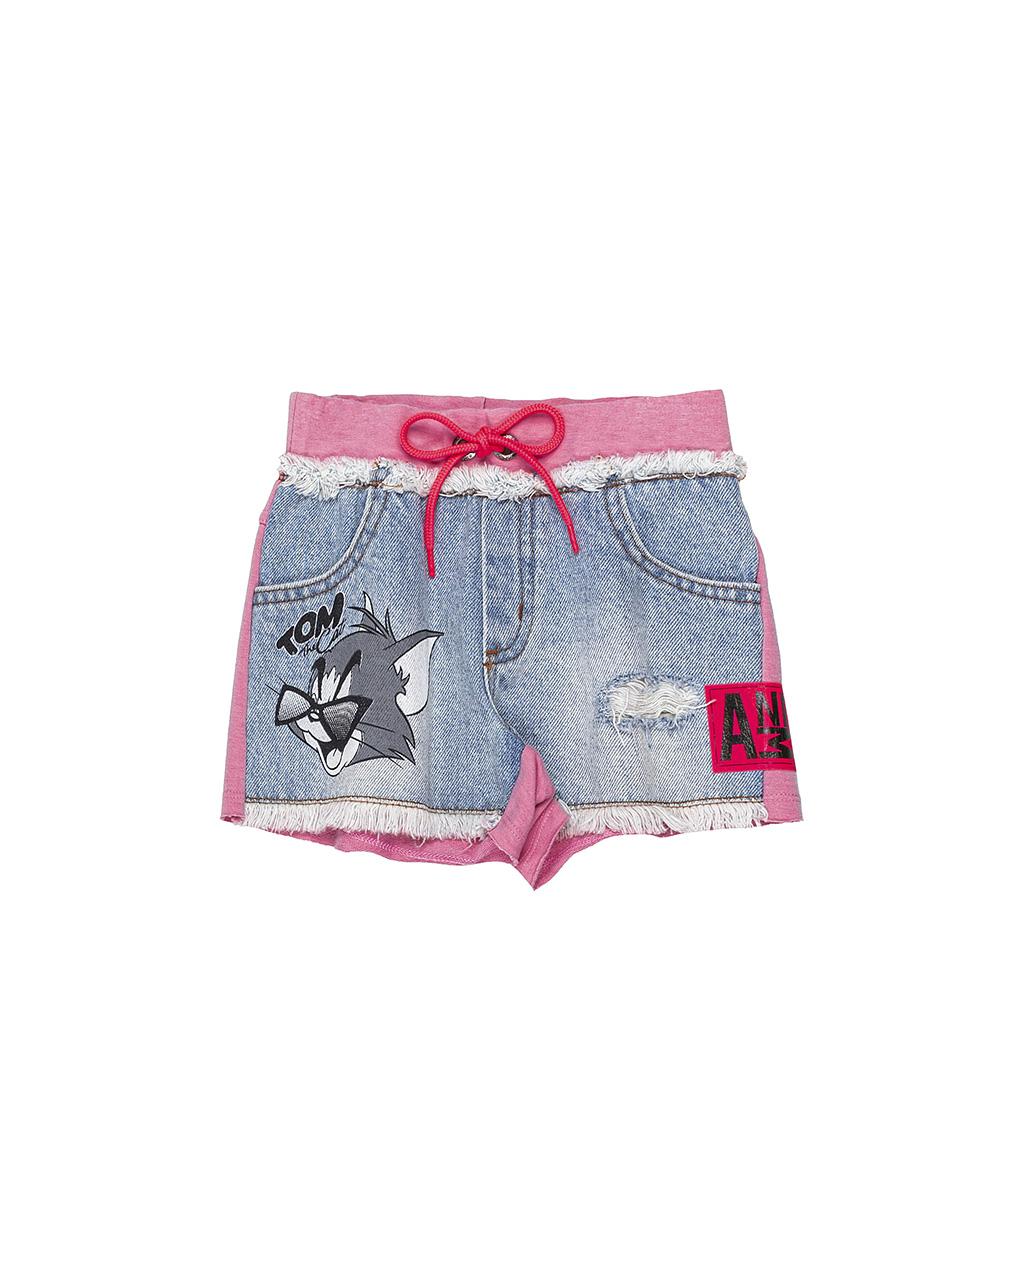 Shorts Infantil Tom e Jerry Jeans Lateral Rosa Animê